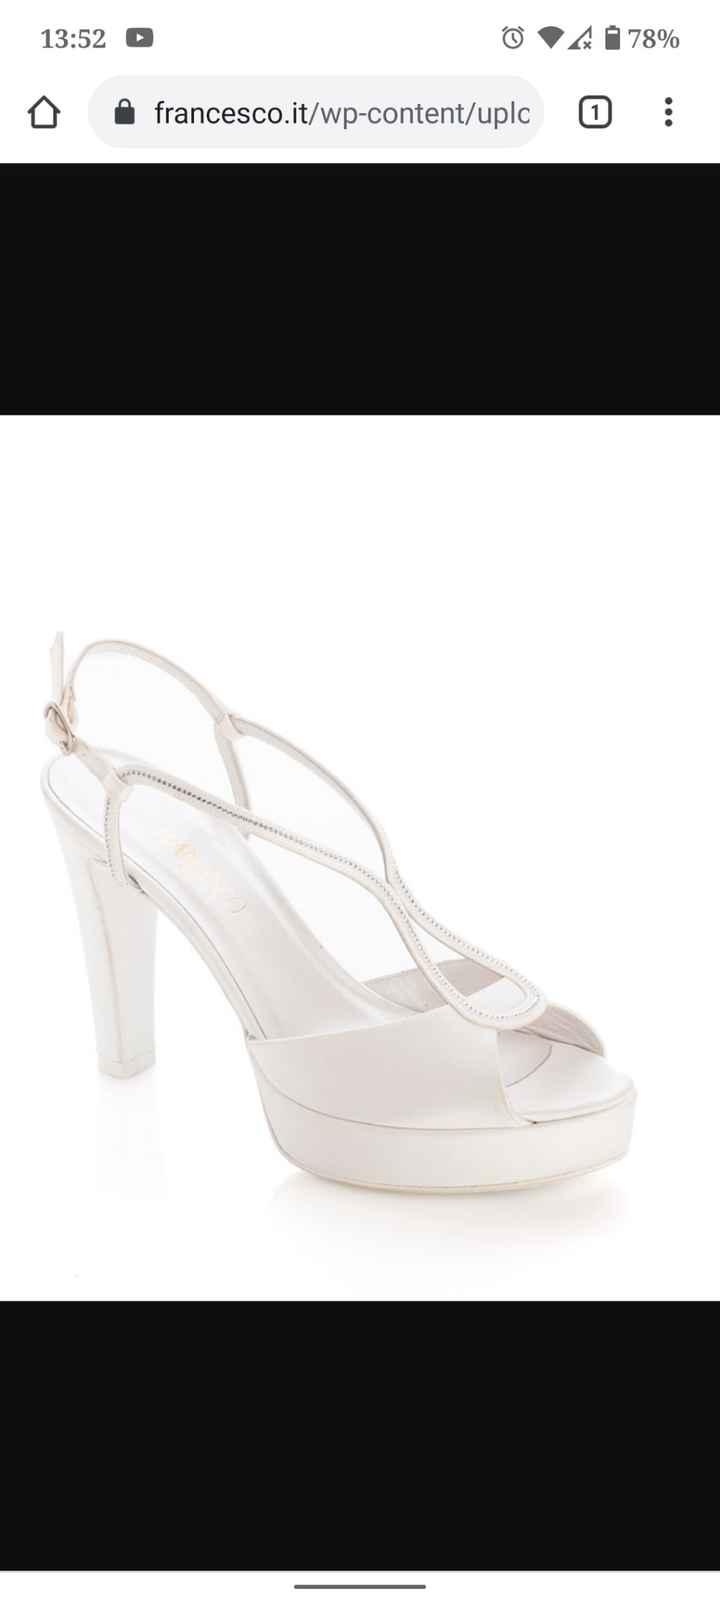 Dubbio scarpe 😩 - 1